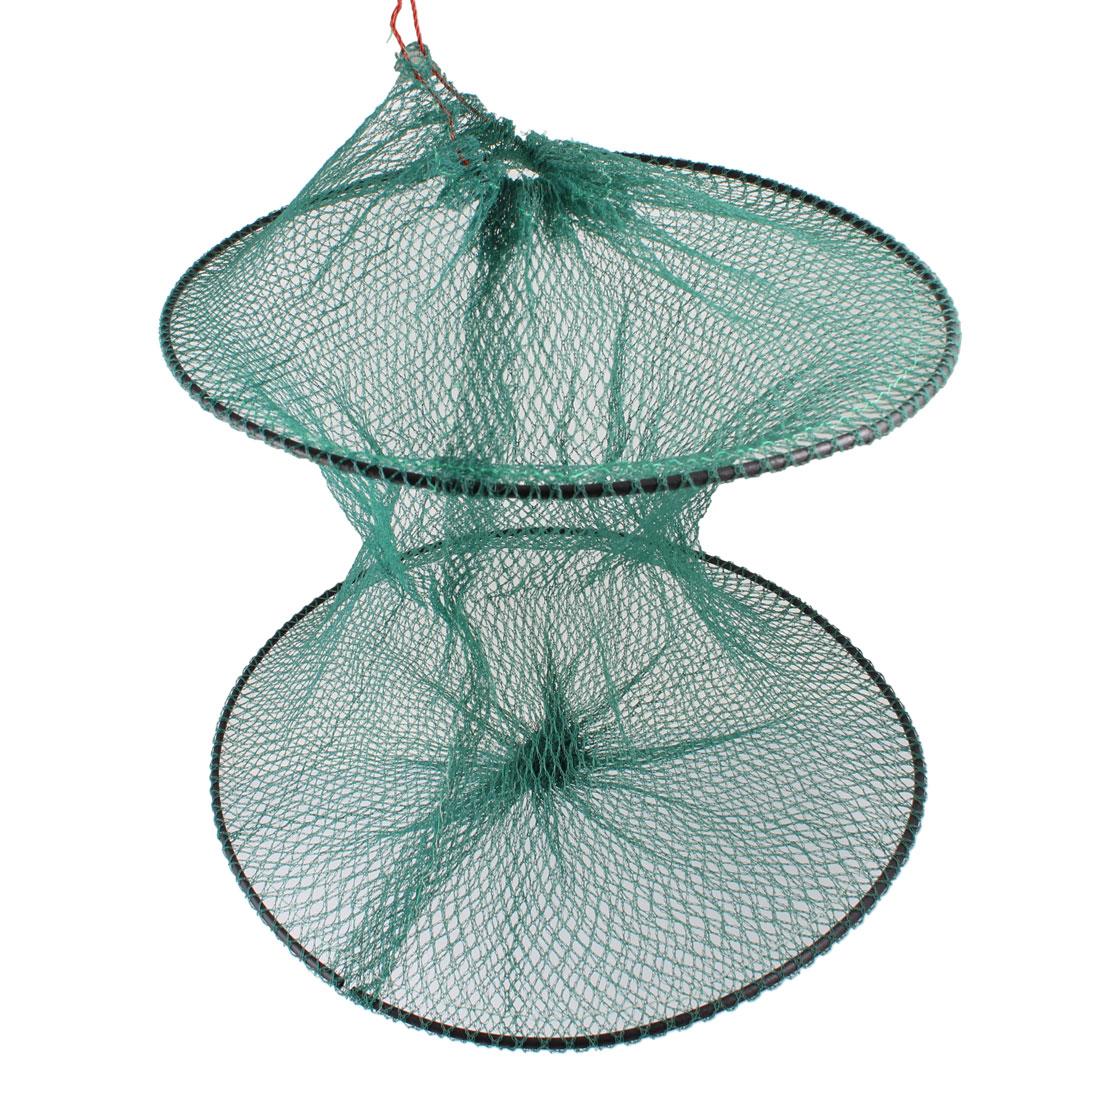 Green 31cm x 38cm Foldable Crawfish Lobster Fishing Keep Net